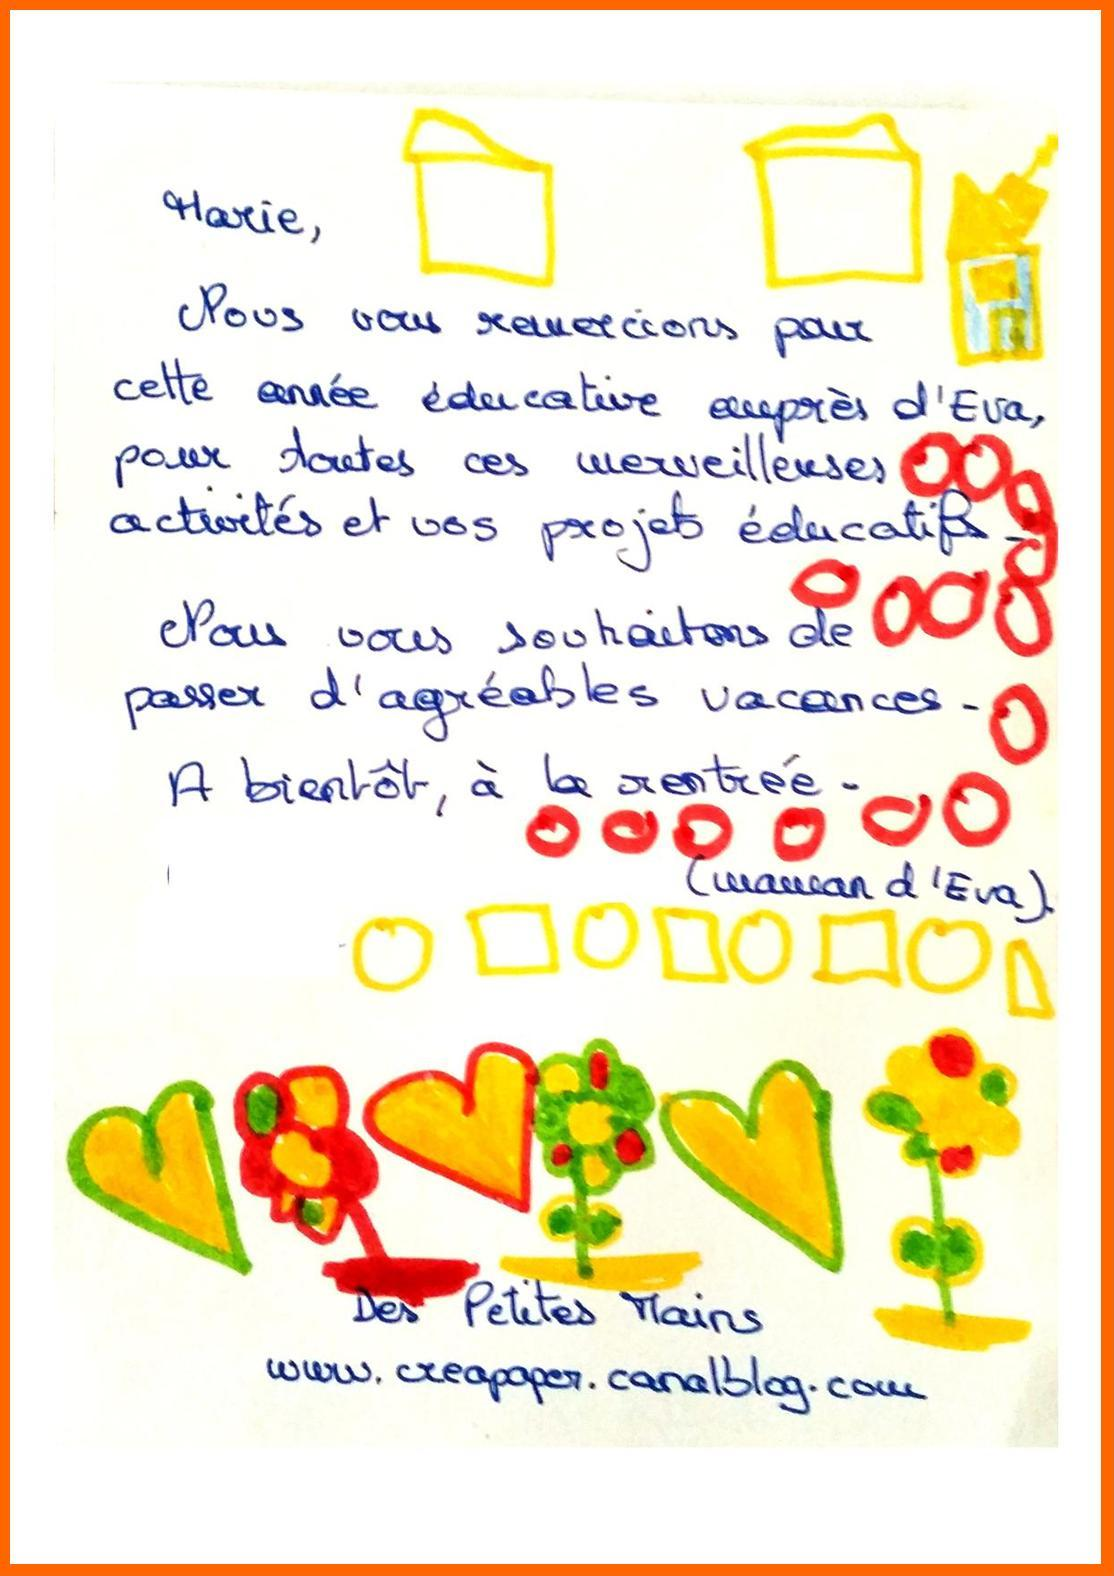 Cartes maitresse Marie 2